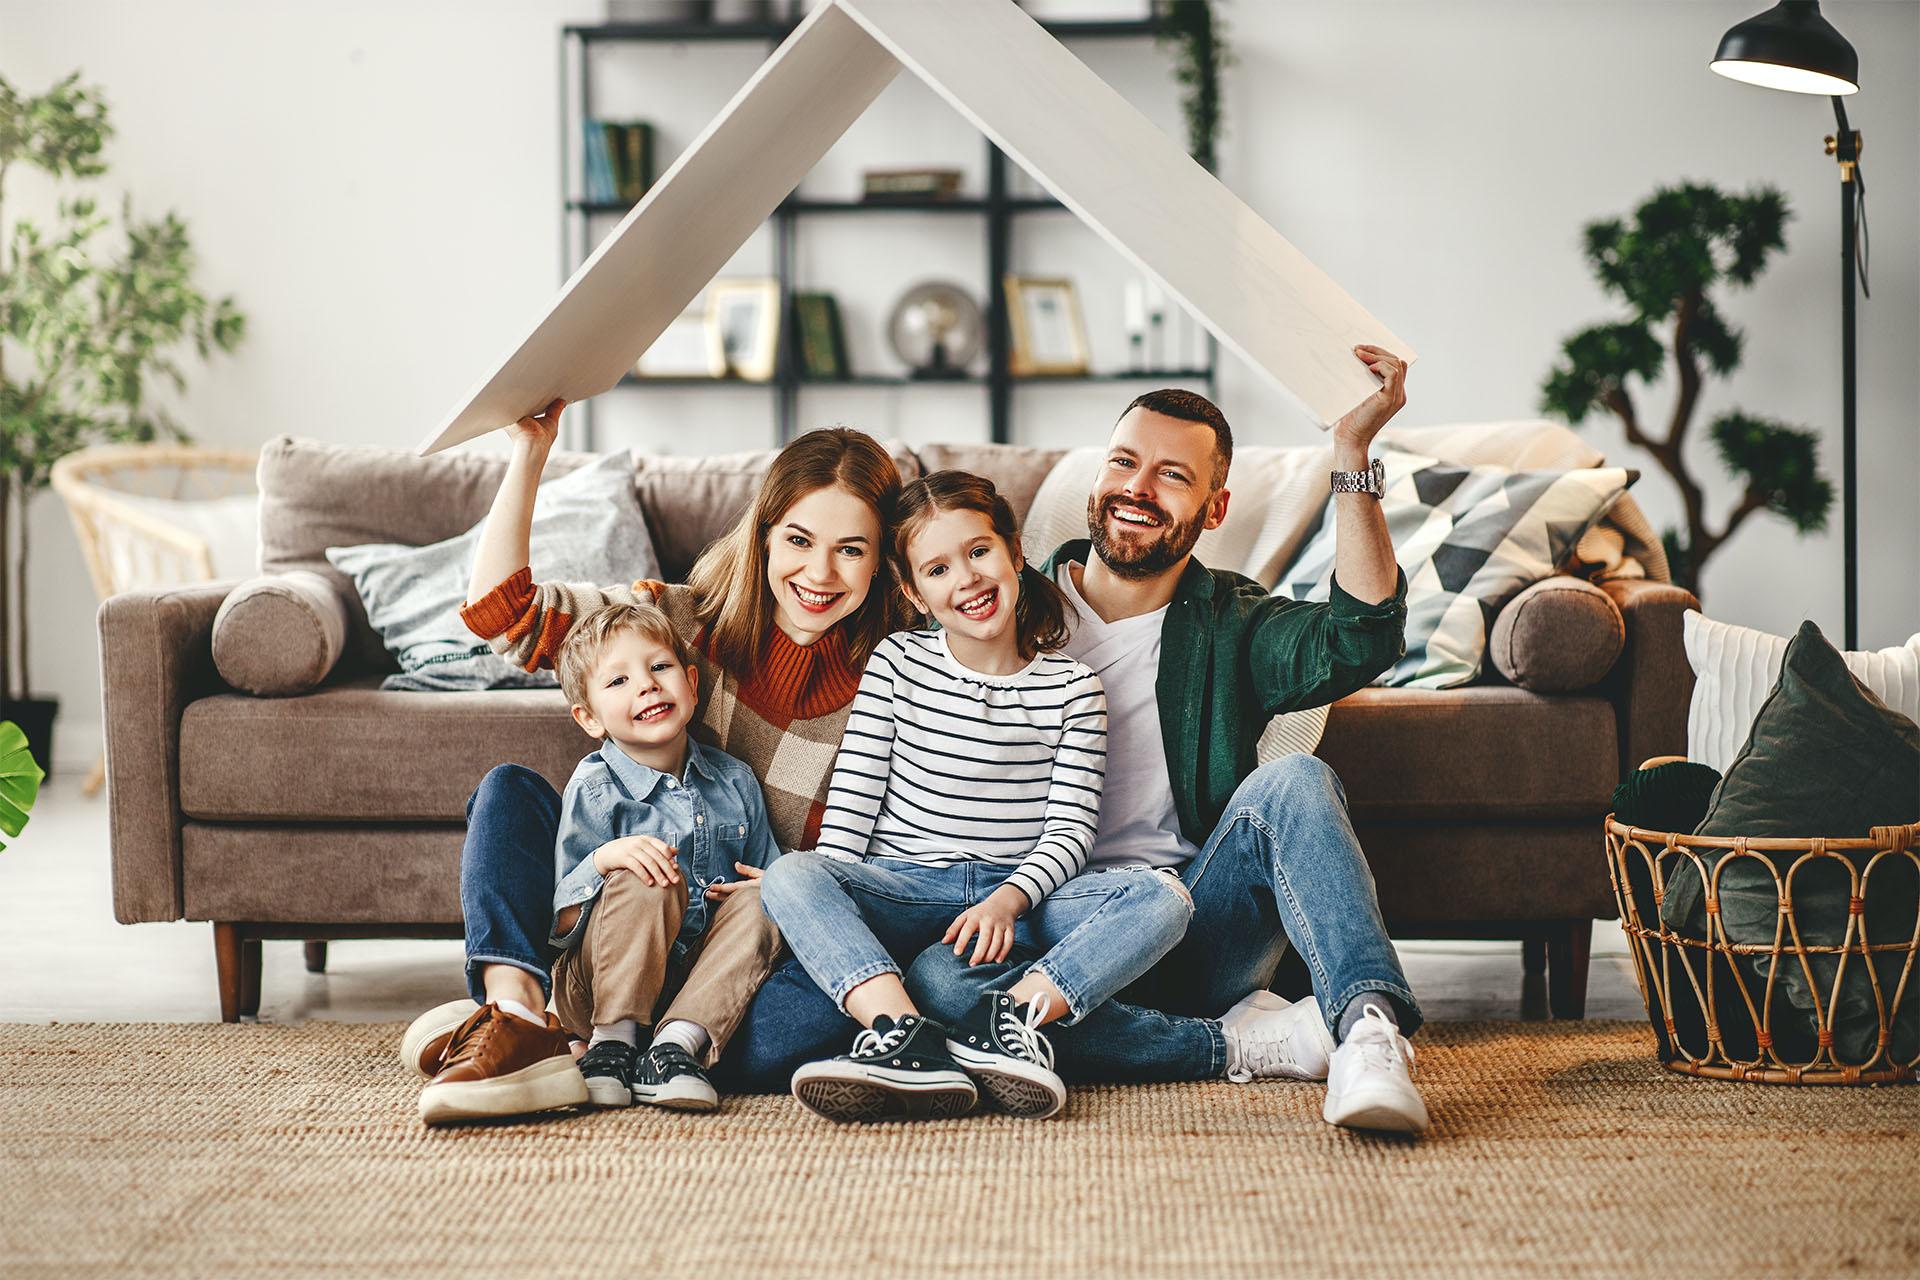 Hillewaere Hypotheken